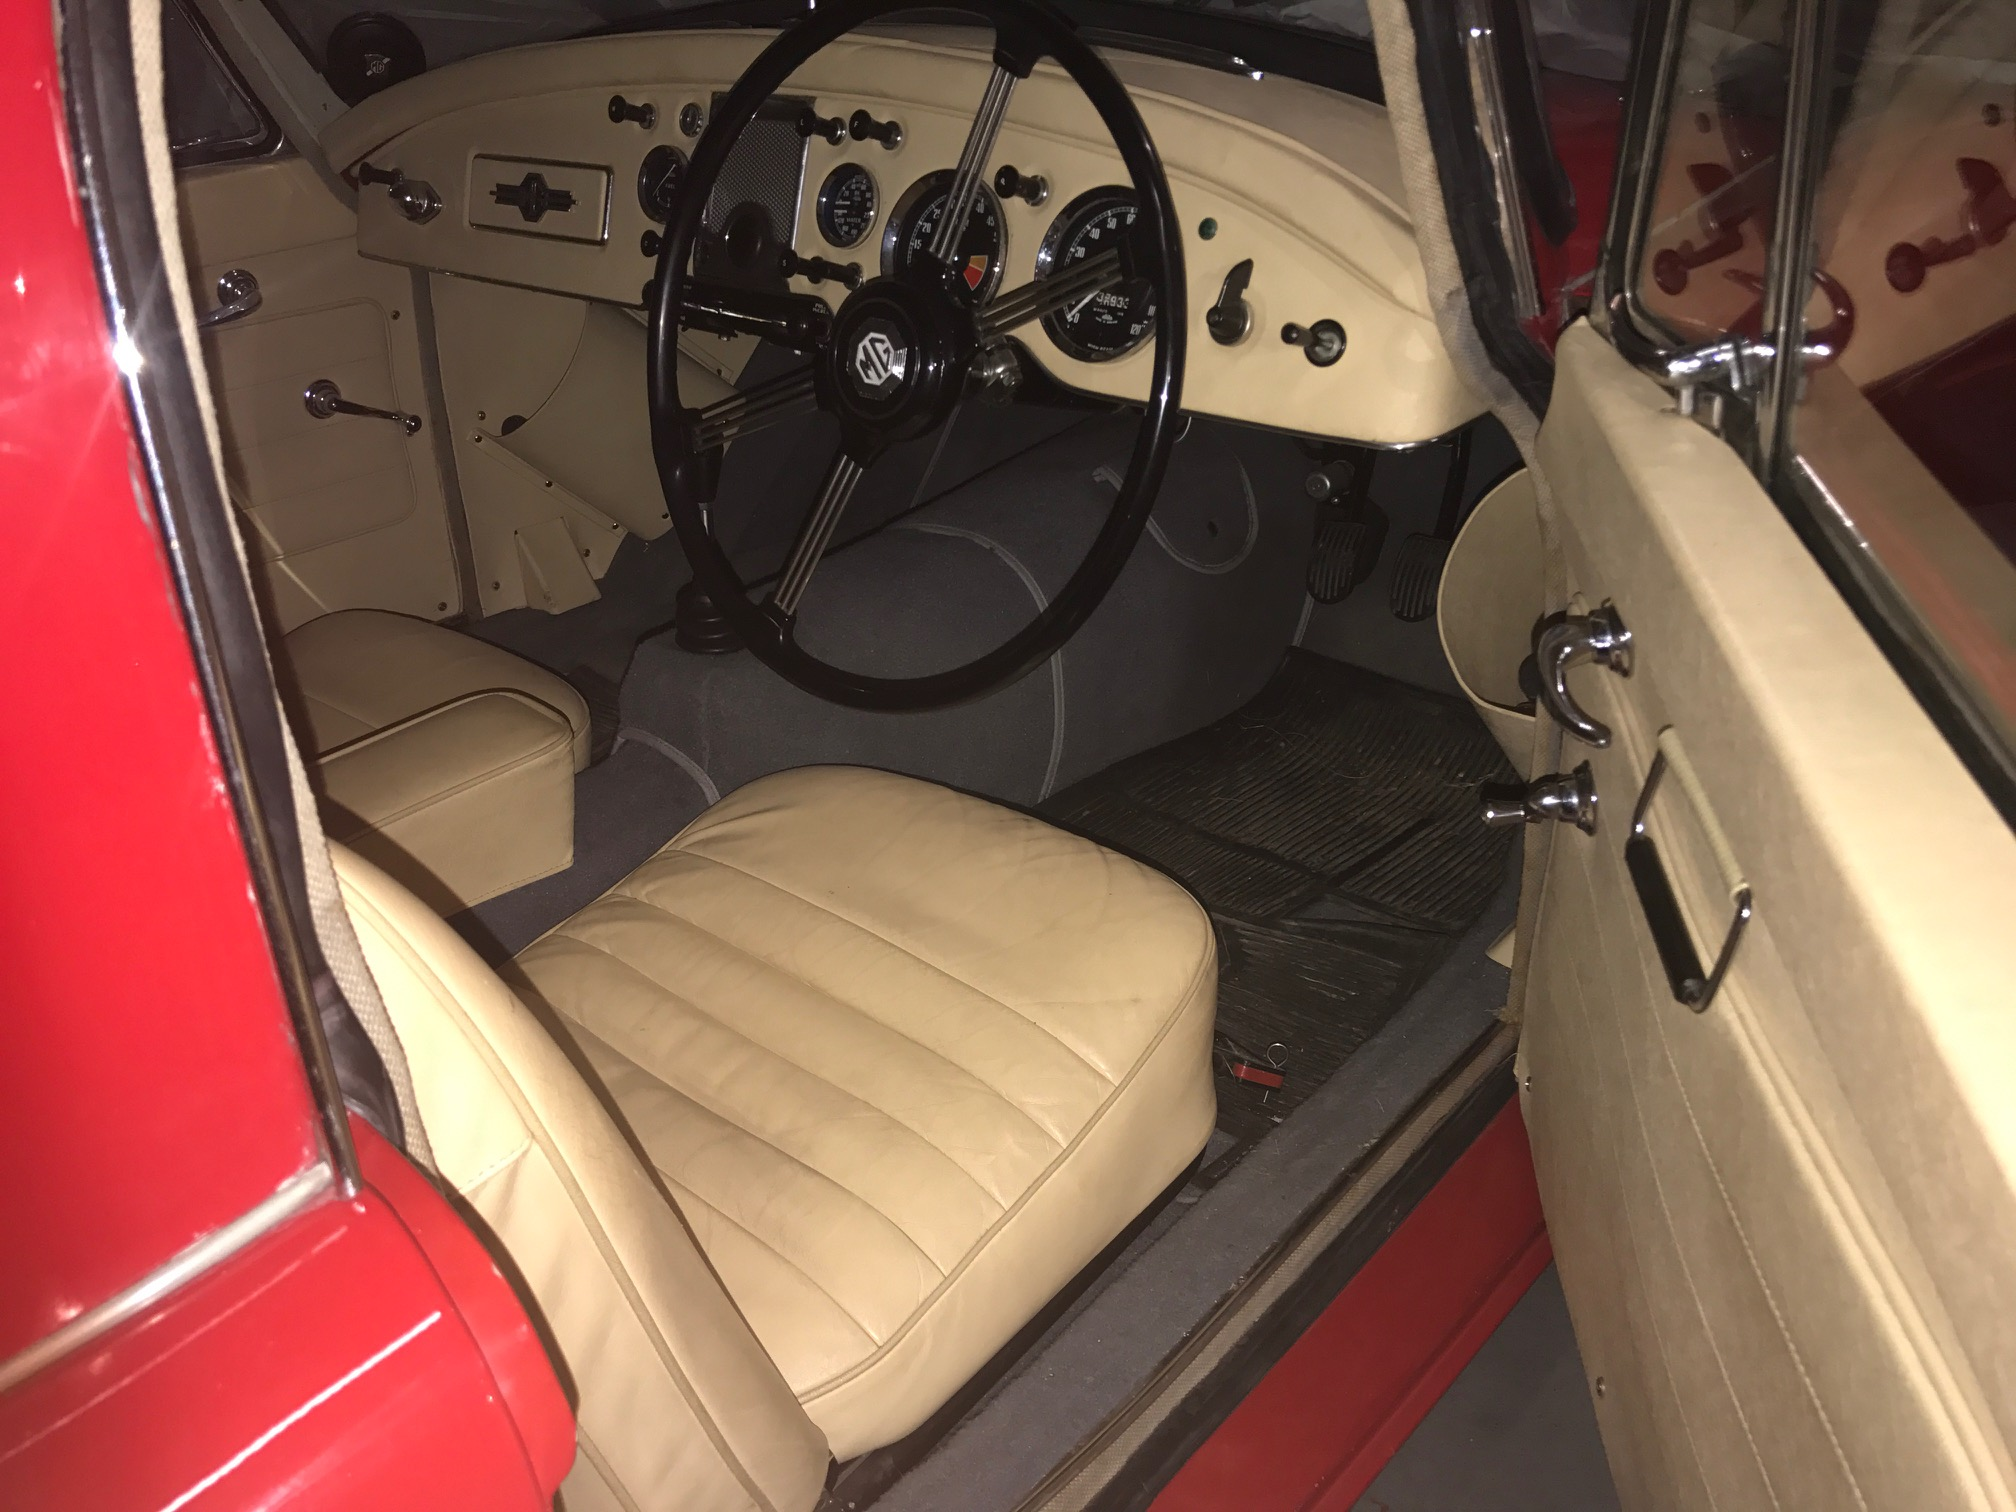 mga coupe interior trim options mga register. Black Bedroom Furniture Sets. Home Design Ideas